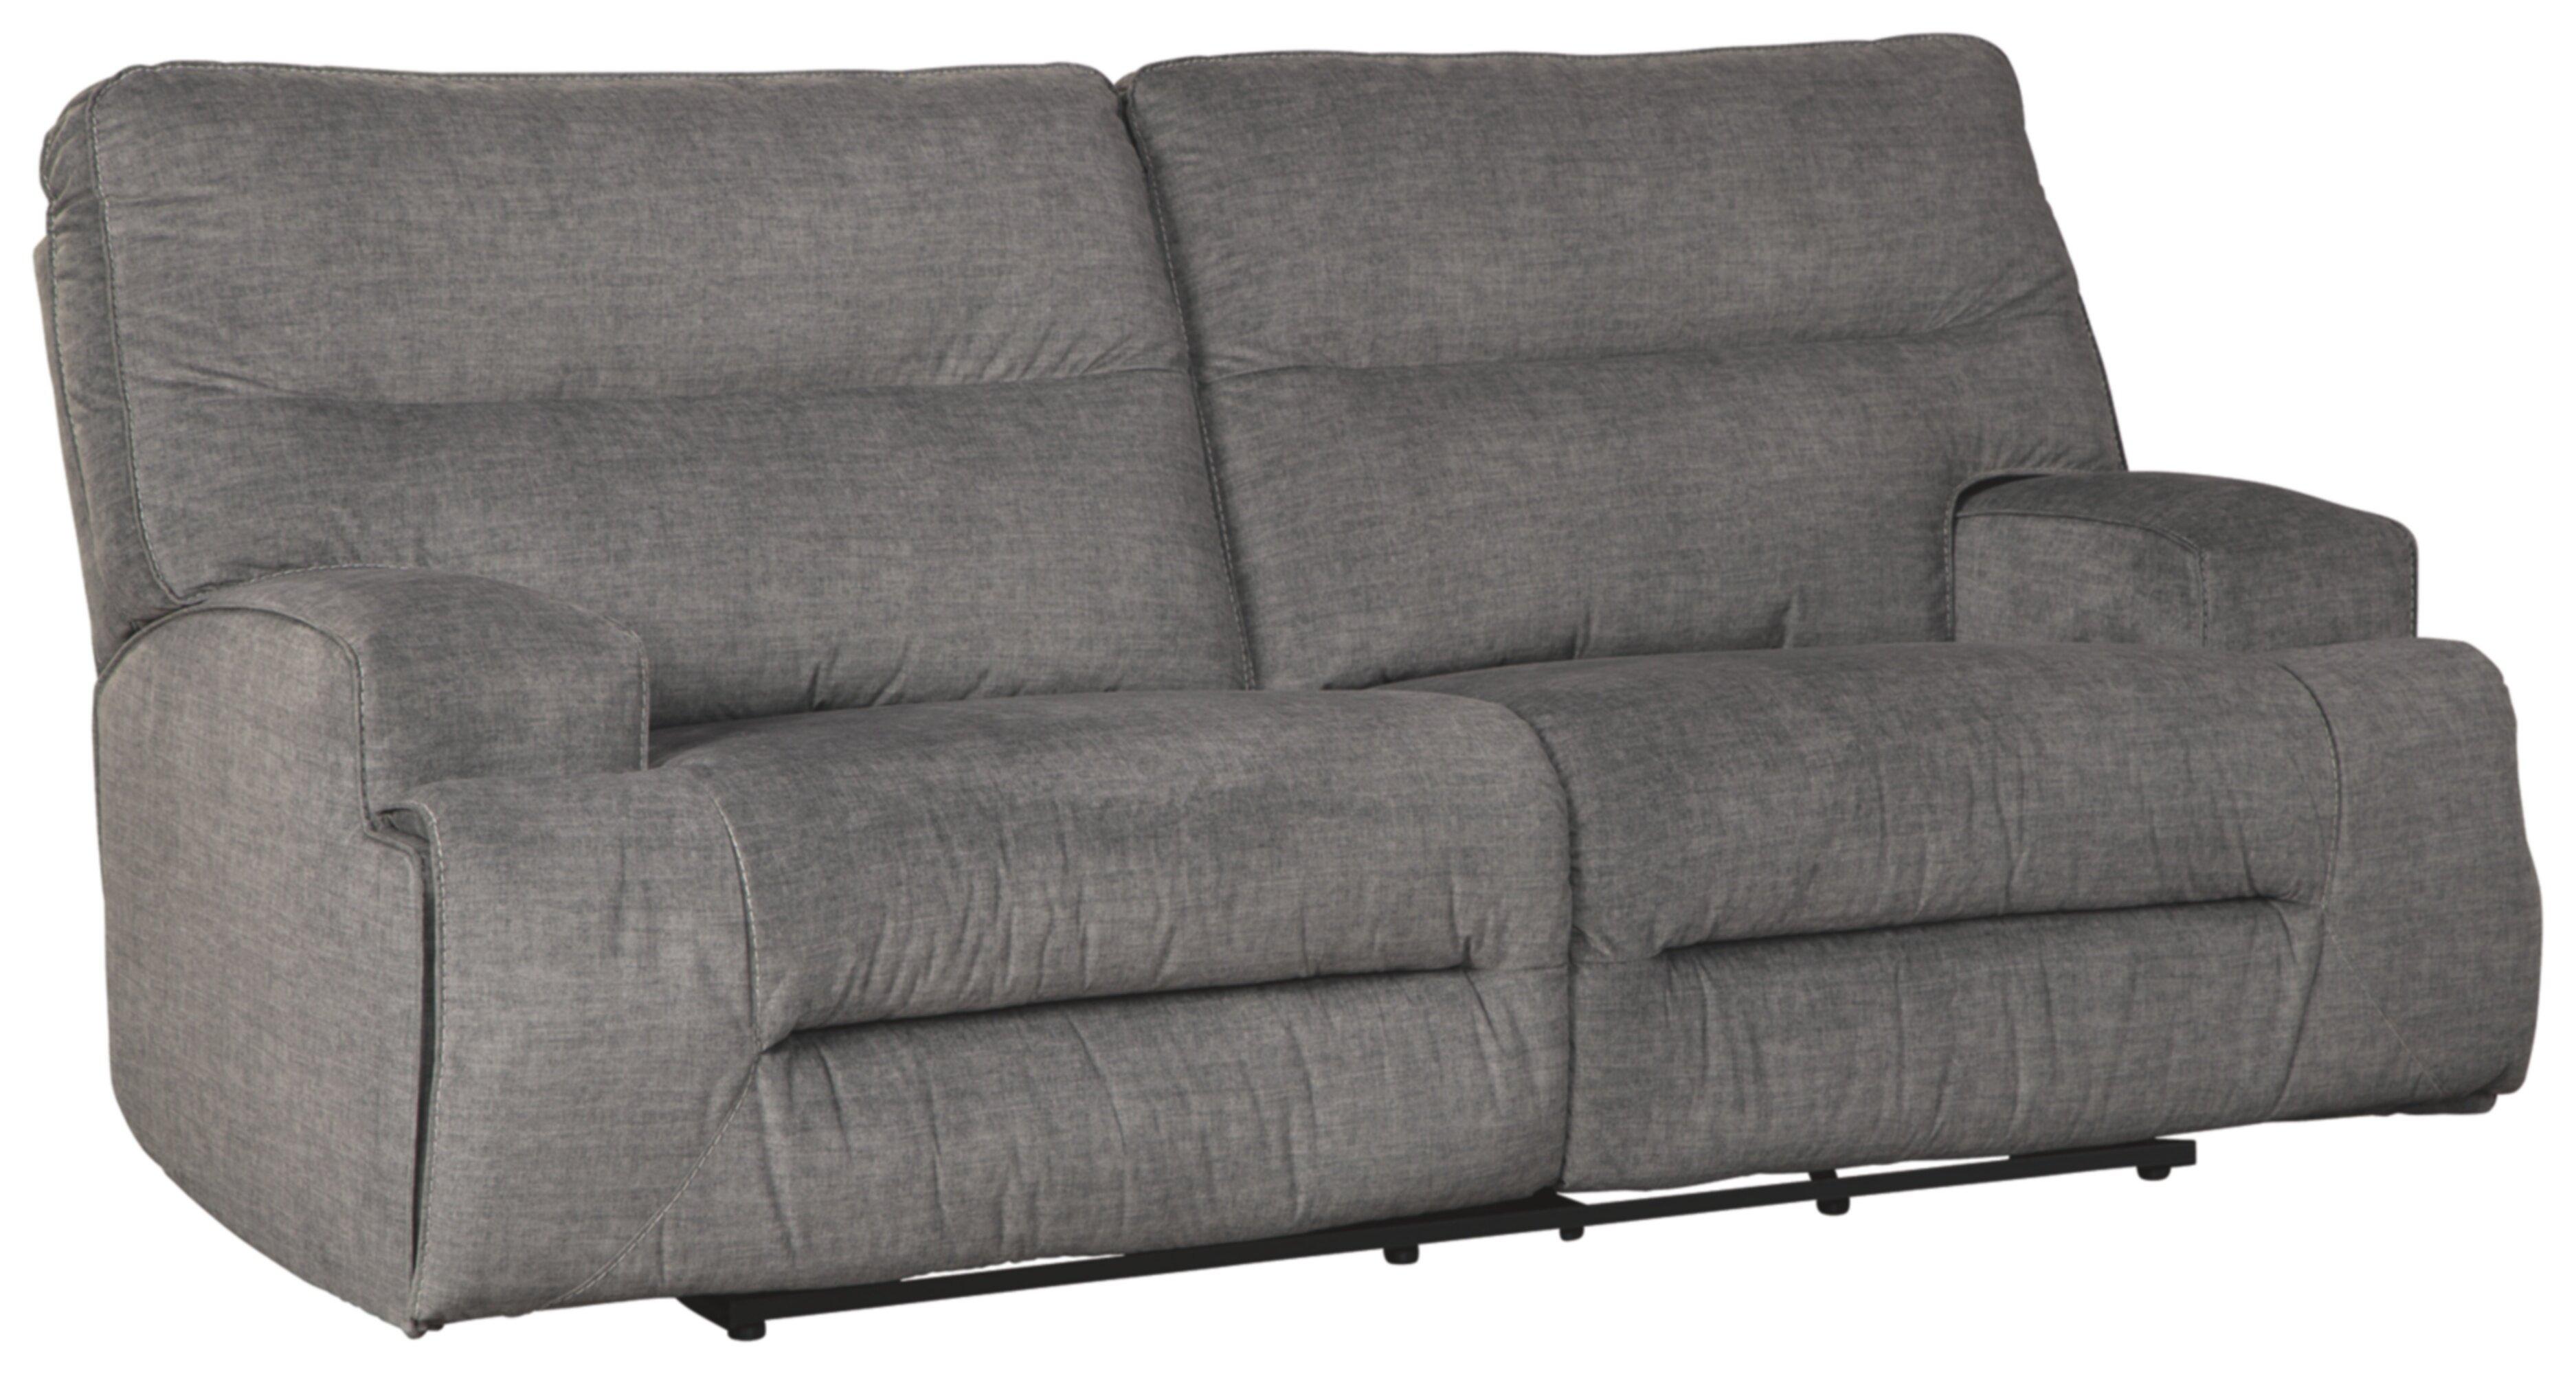 Red Barrel Studio Amann Reclining Sofa Wayfair